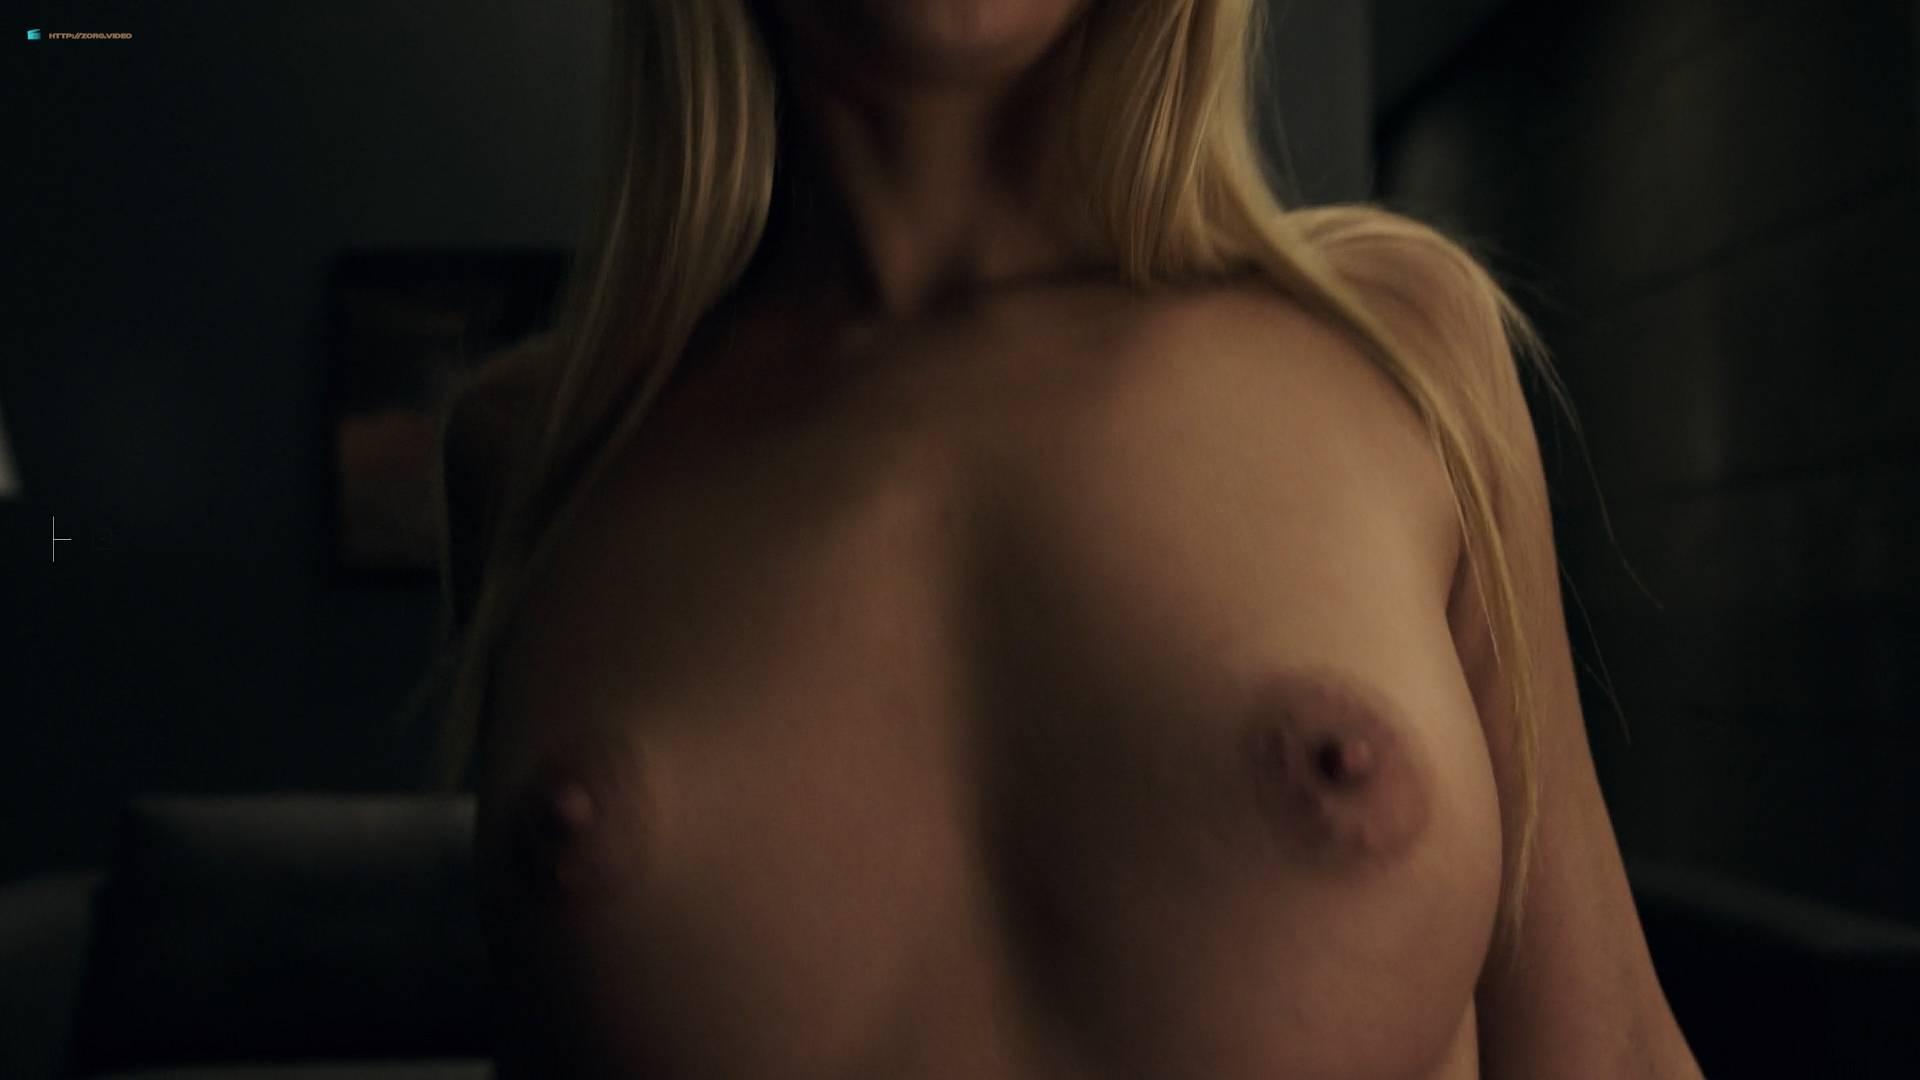 anon nudes